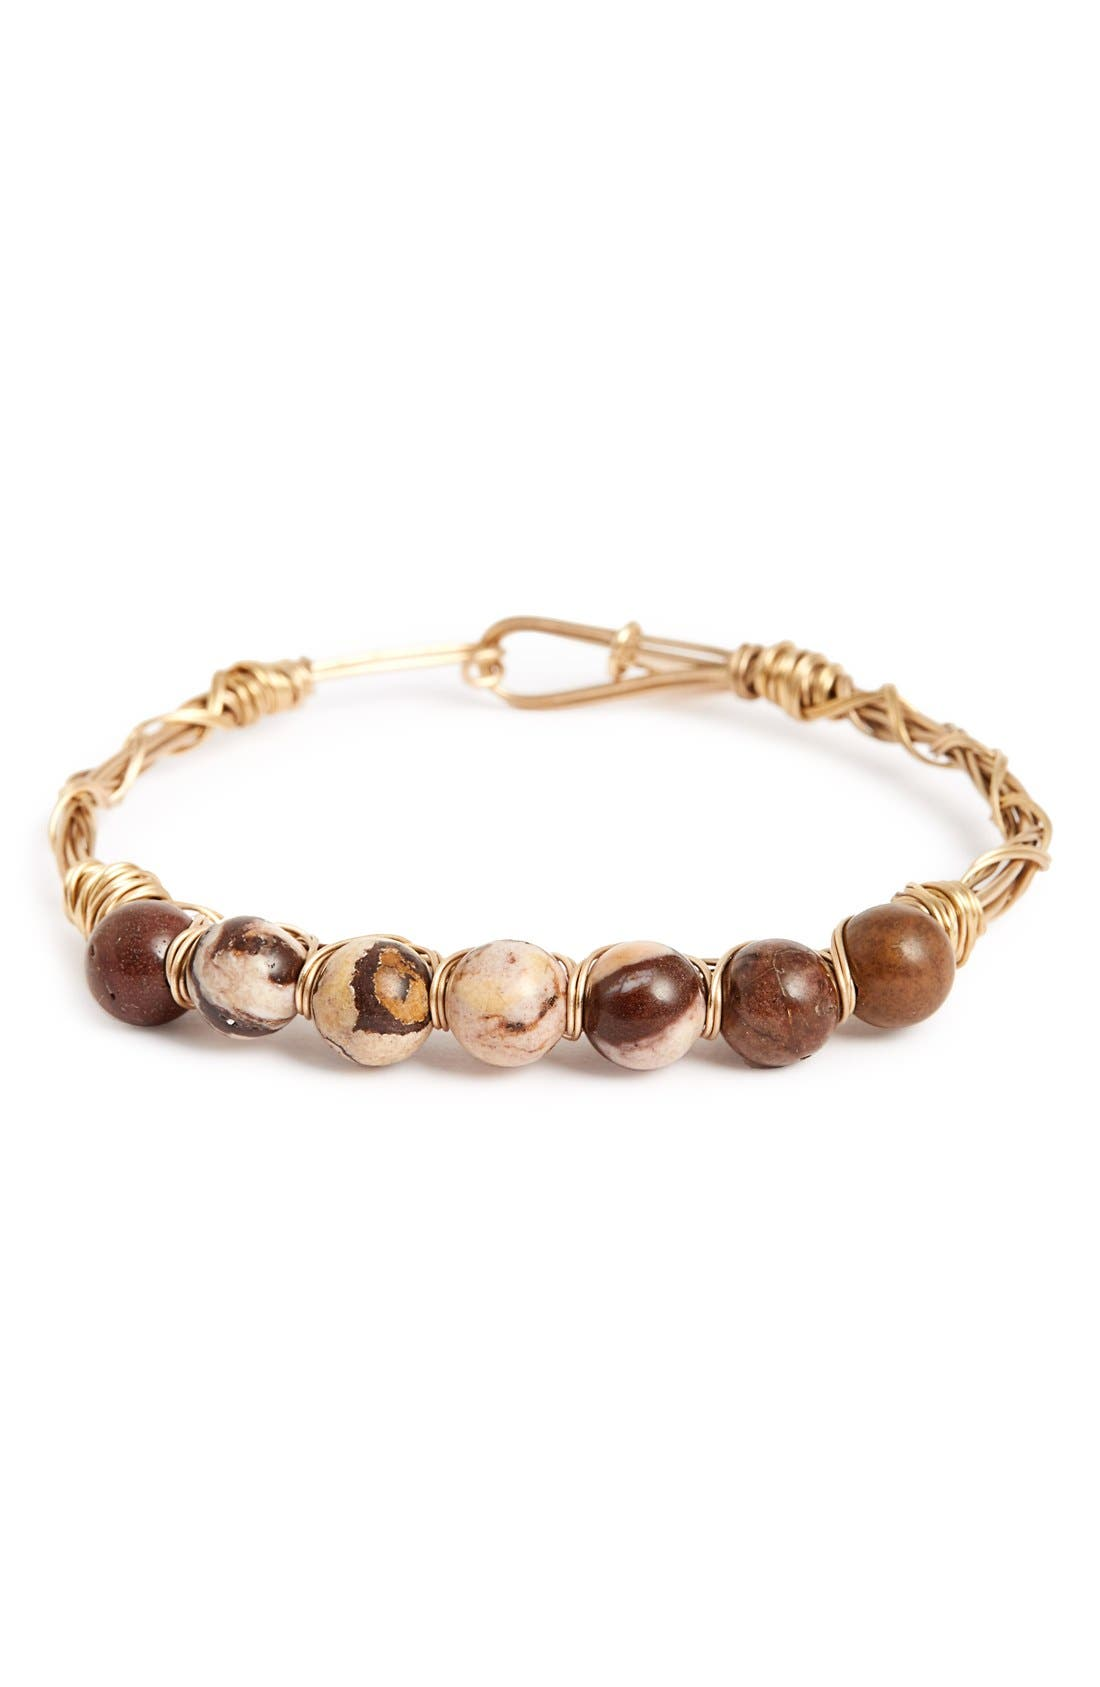 Alternate Image 1 Selected - Canvas Jewelry Wire Wrap Stone Bracelet